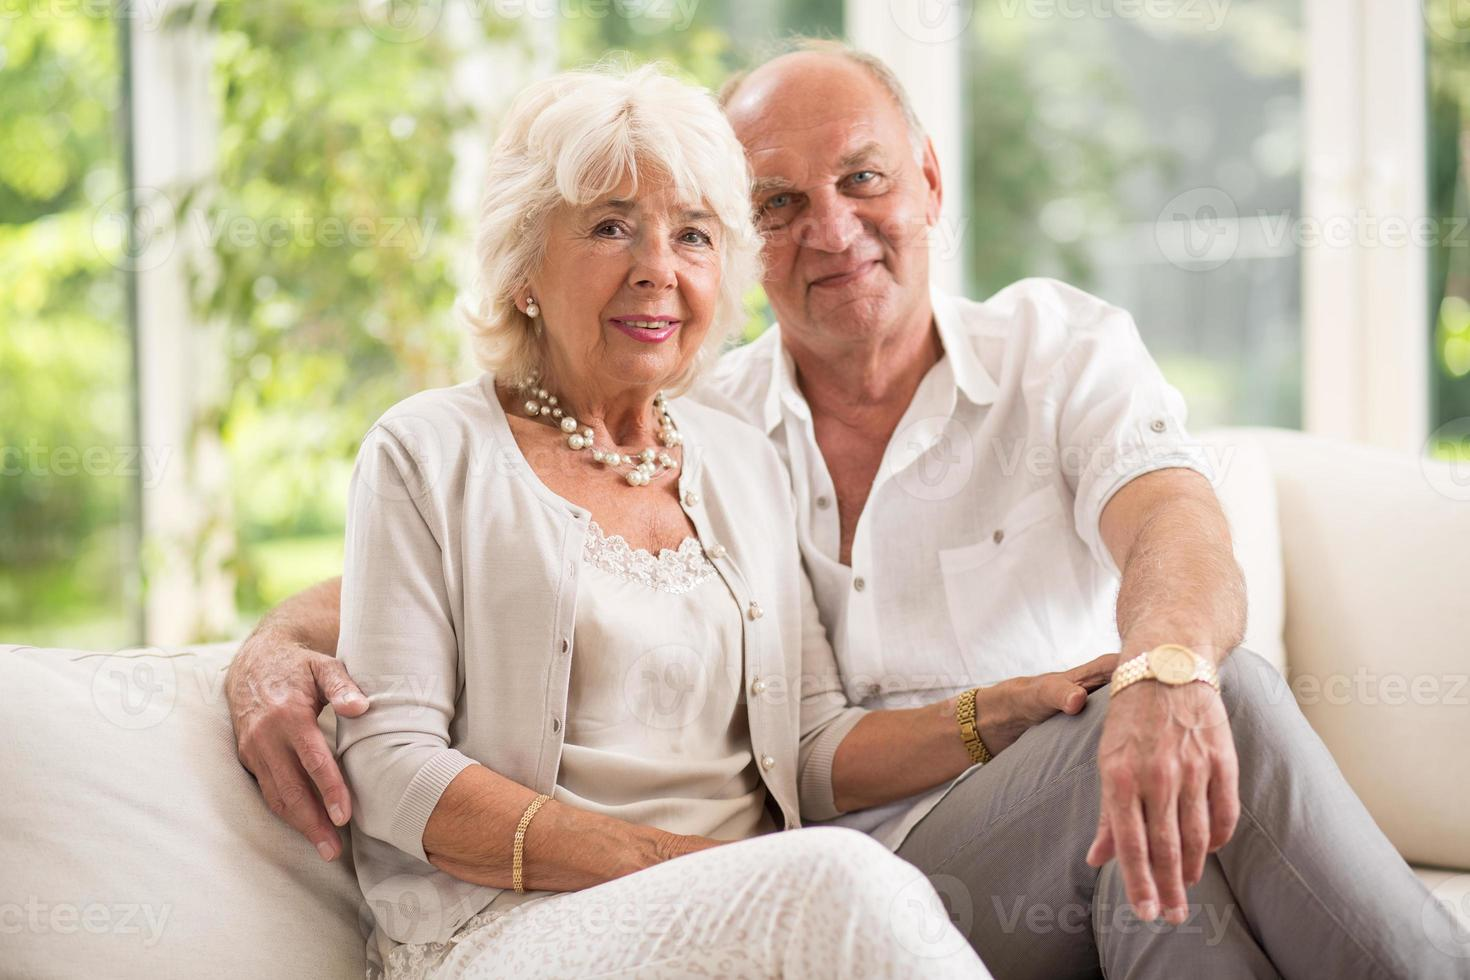 verliebtes älteres Paar foto